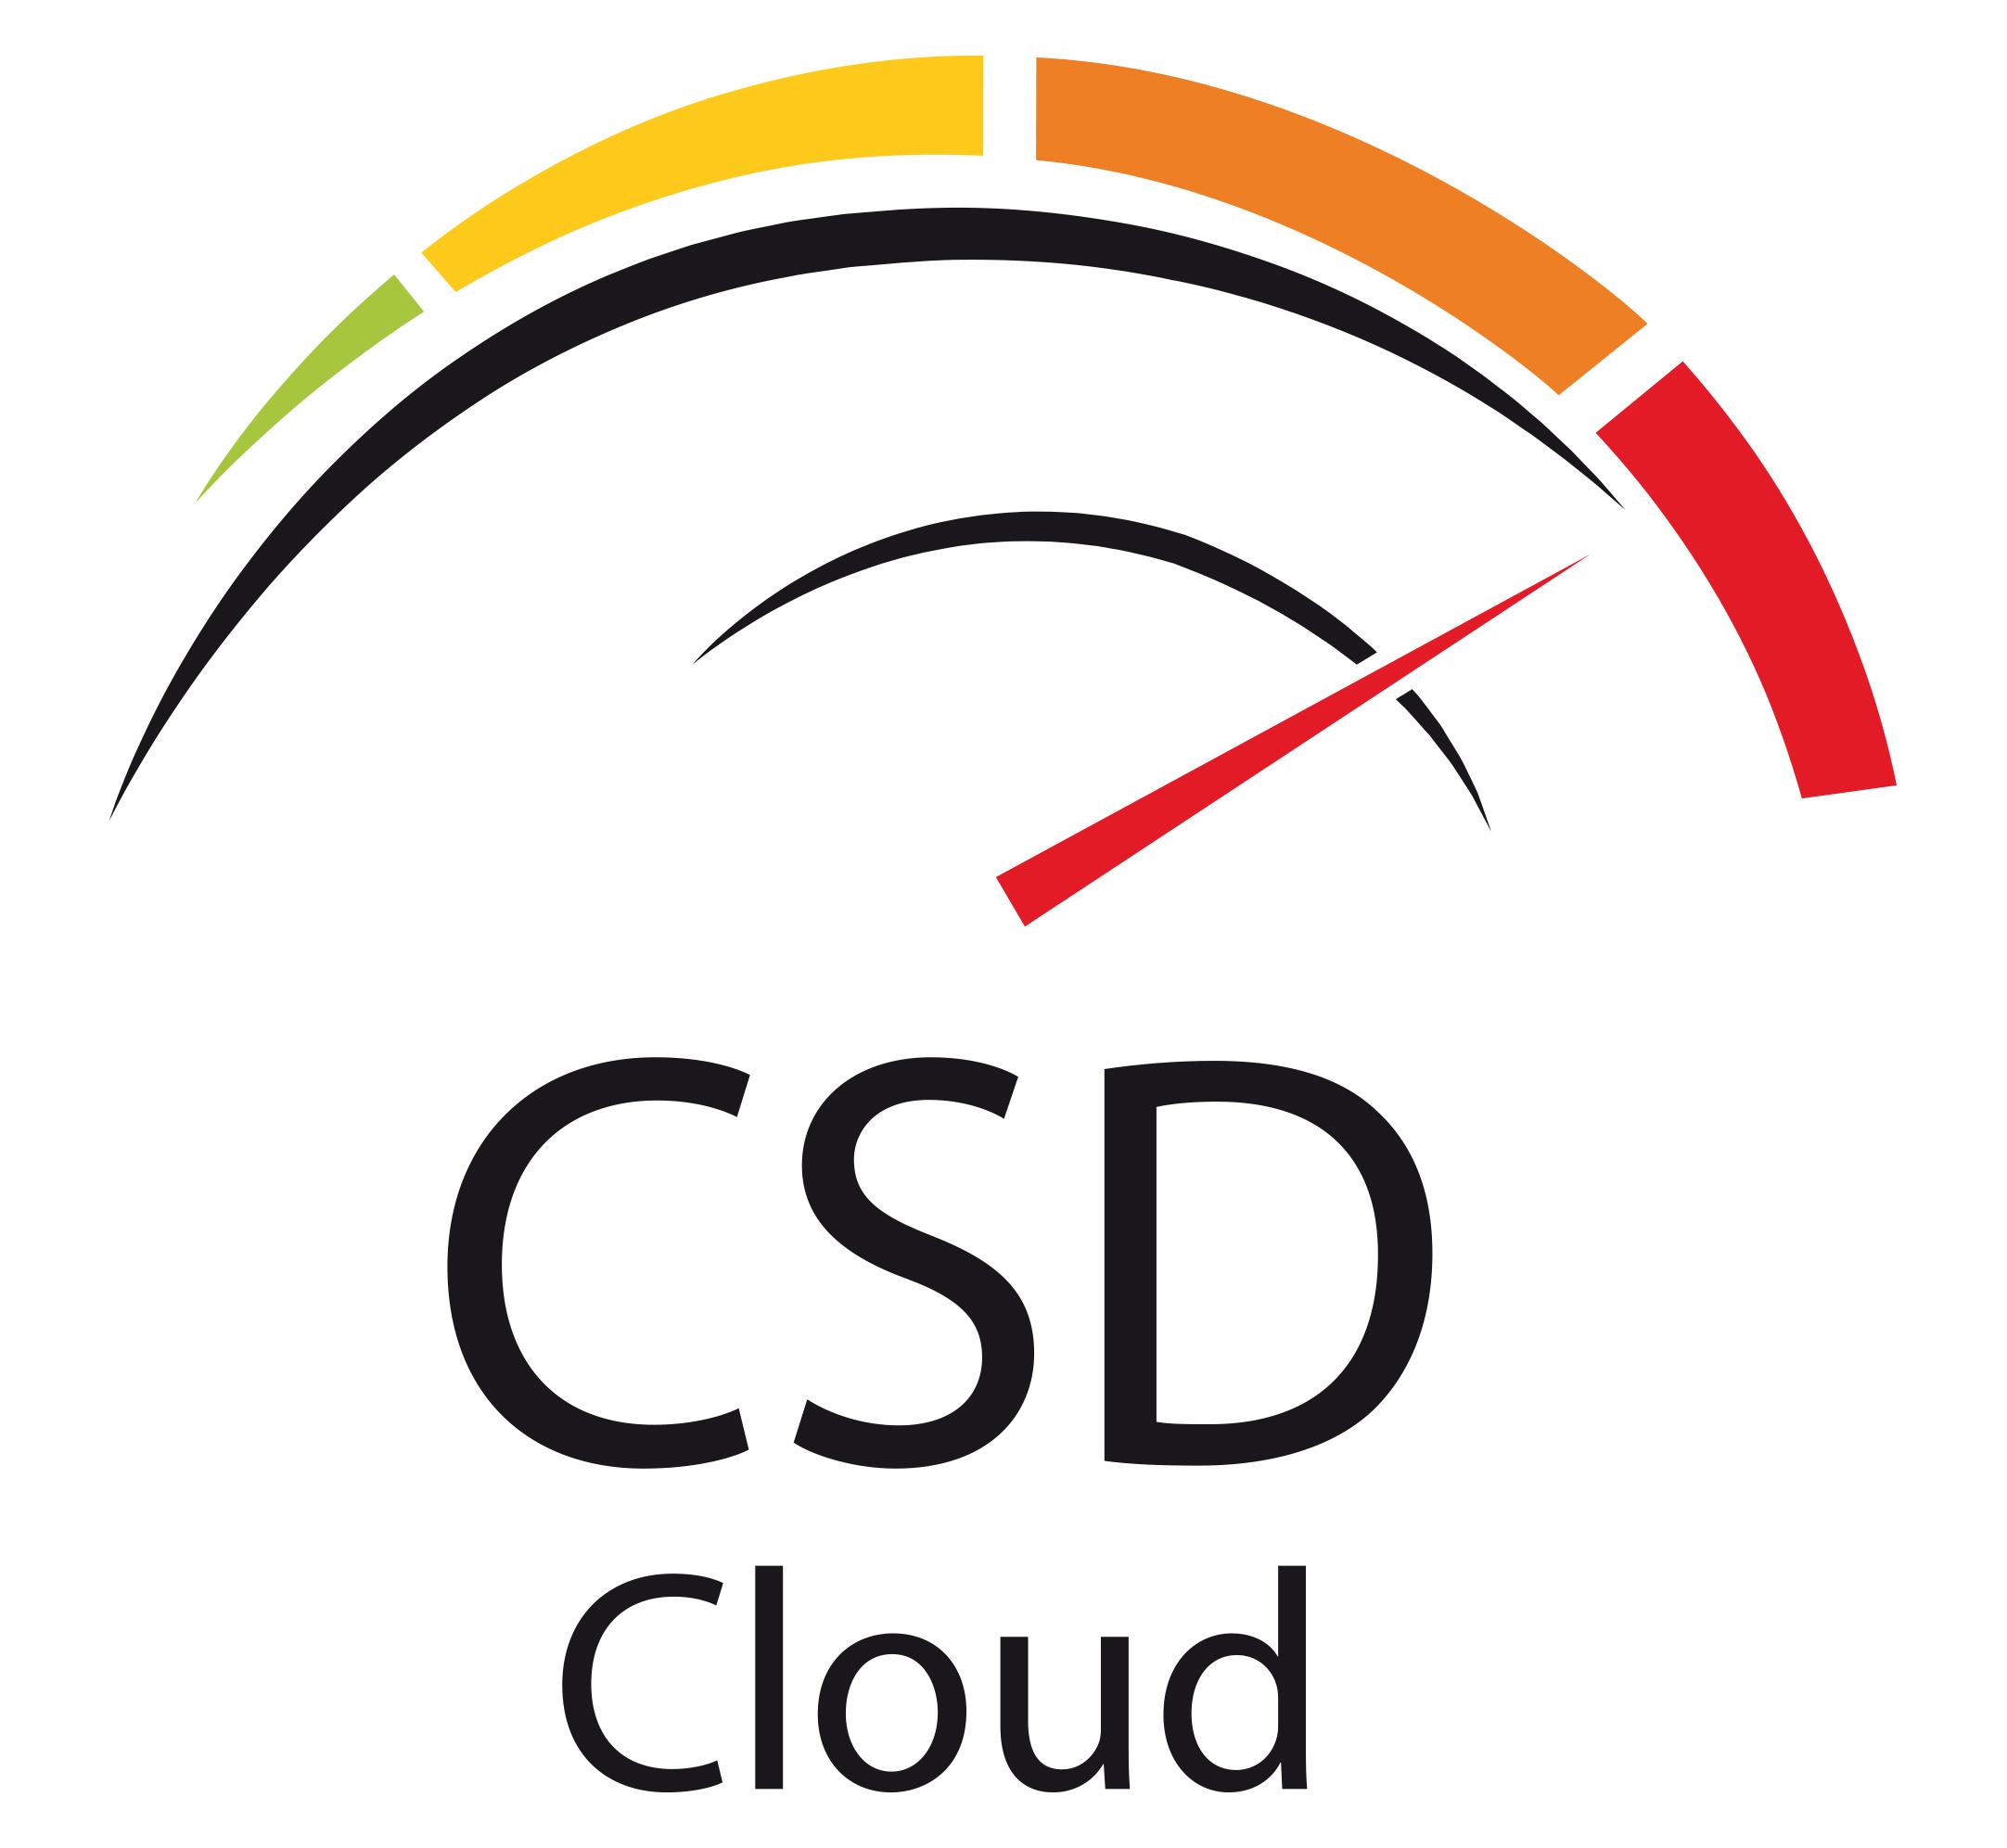 CSD Cloud